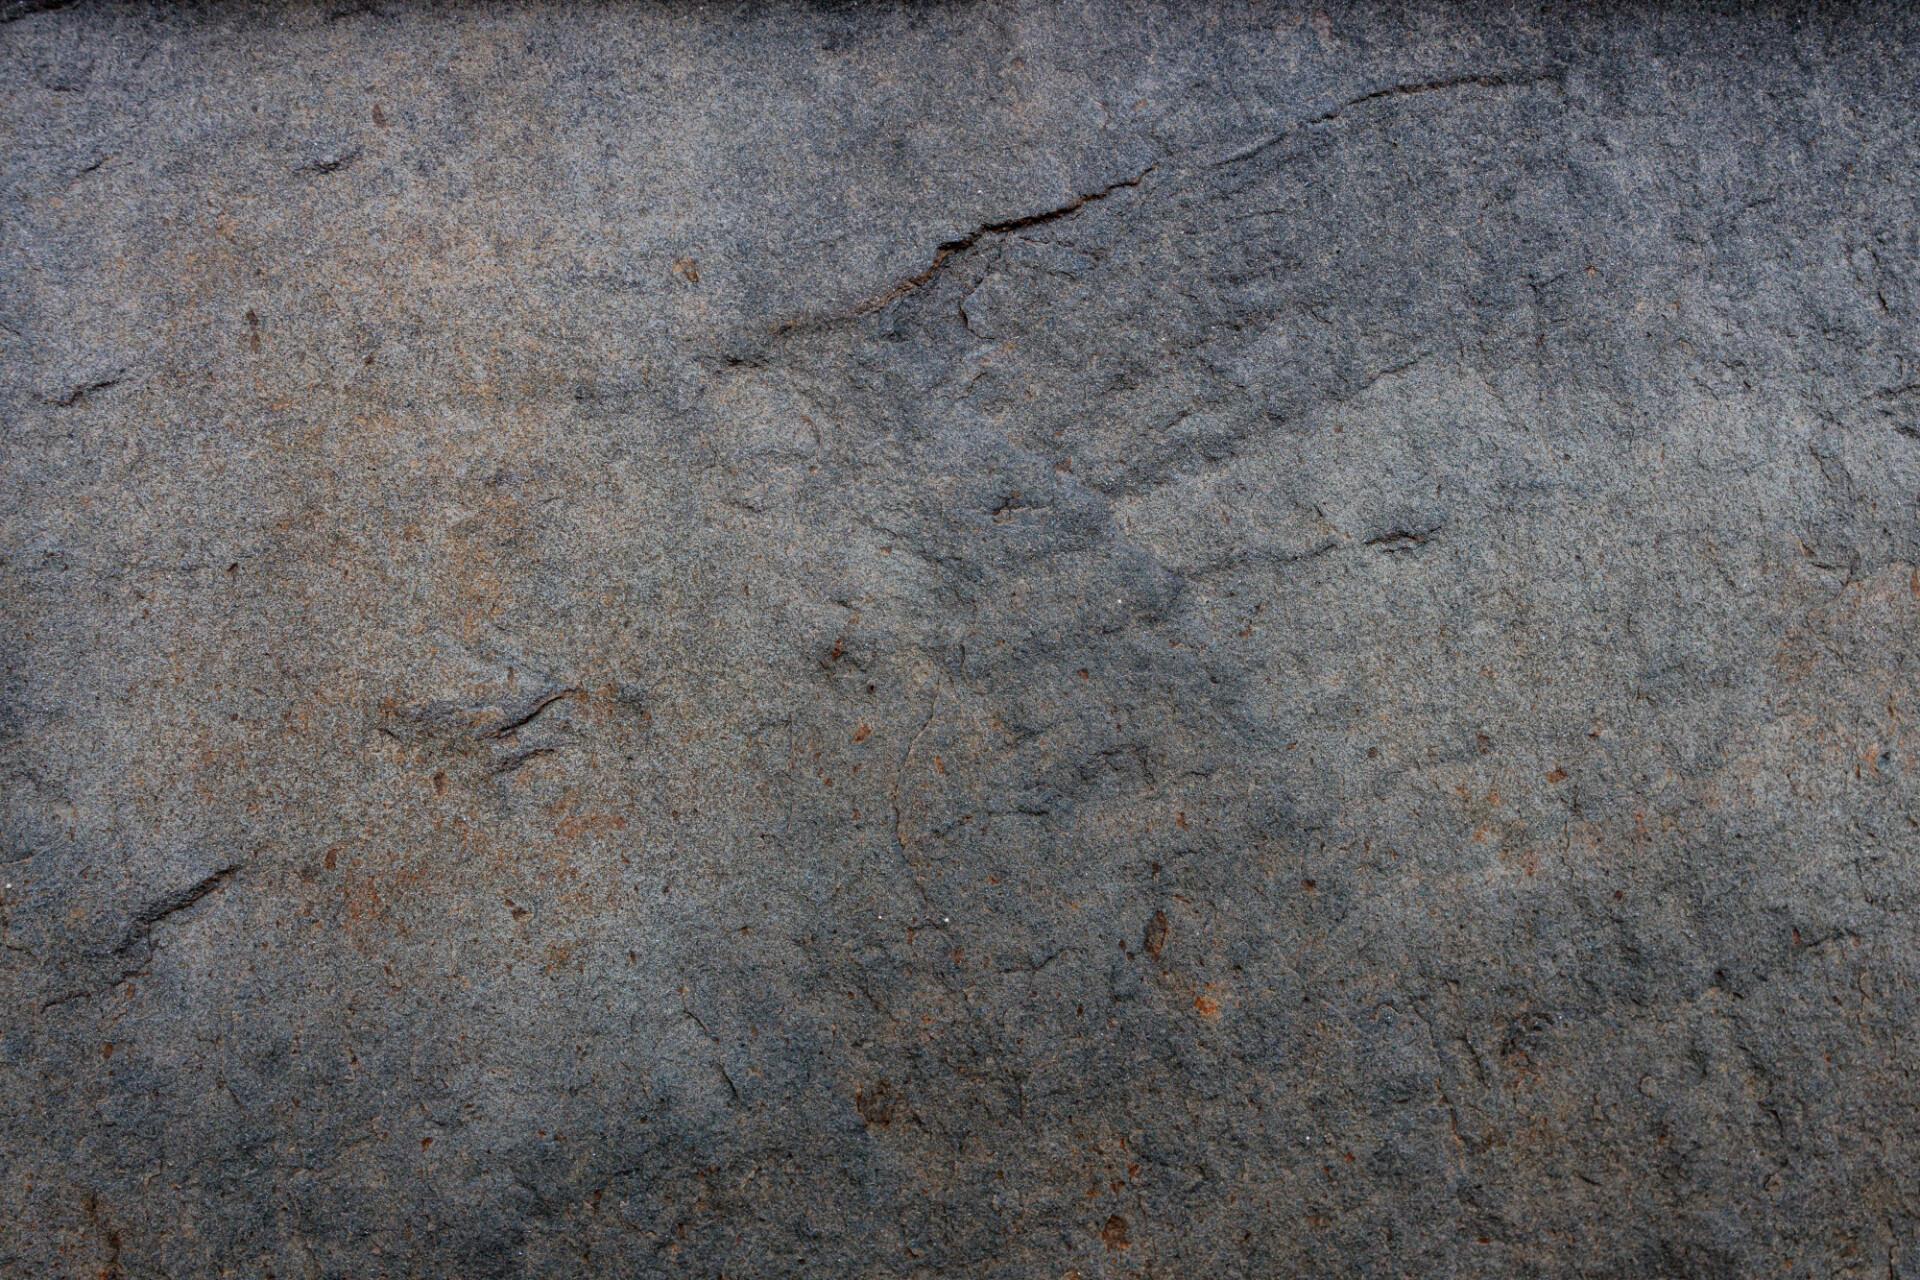 Dark rough stone texture